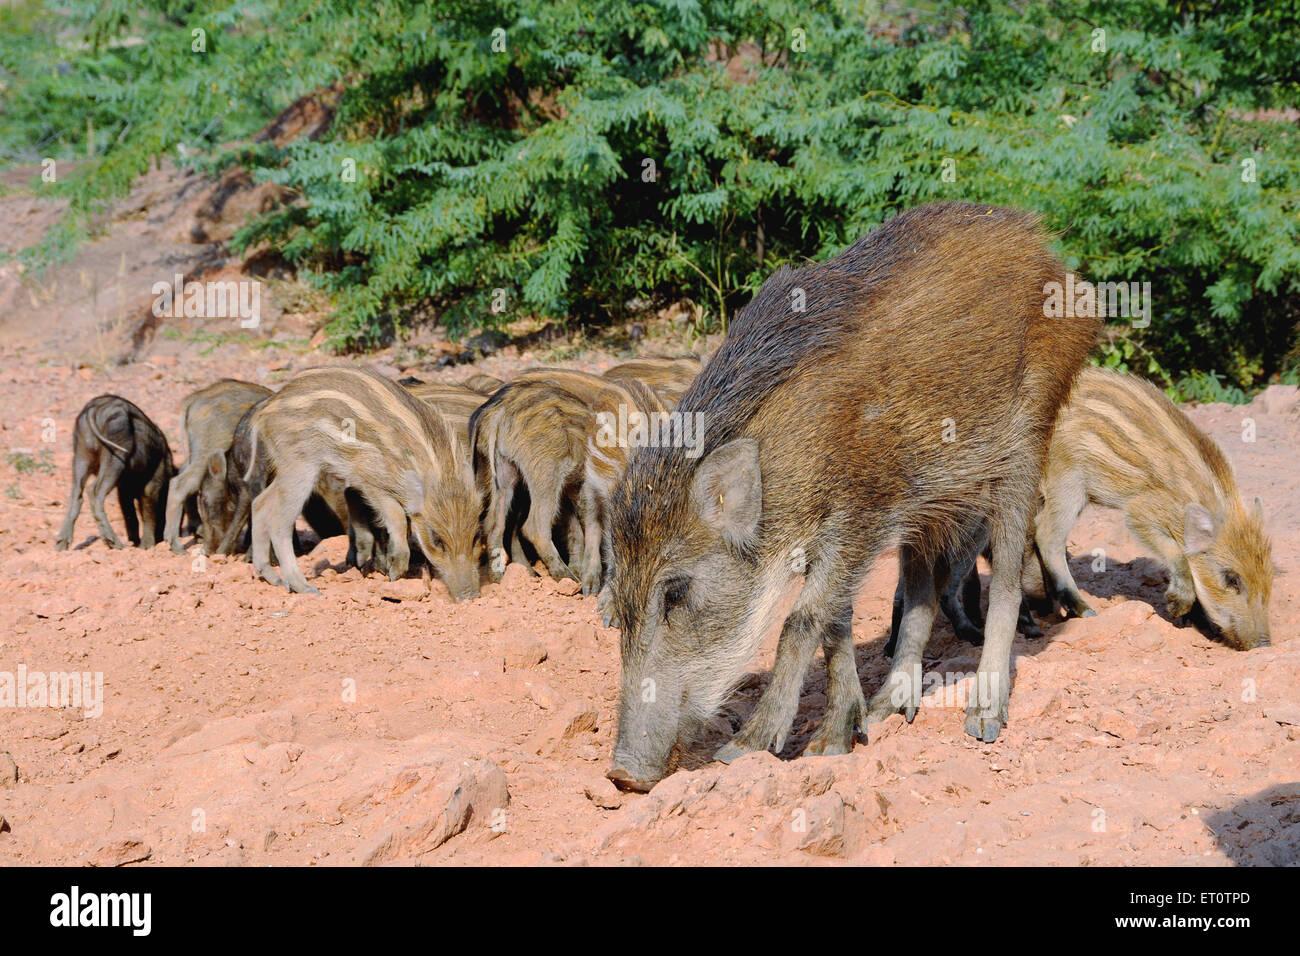 Wild pig sus scrofa cristatus with its kid ; India - Stock Image